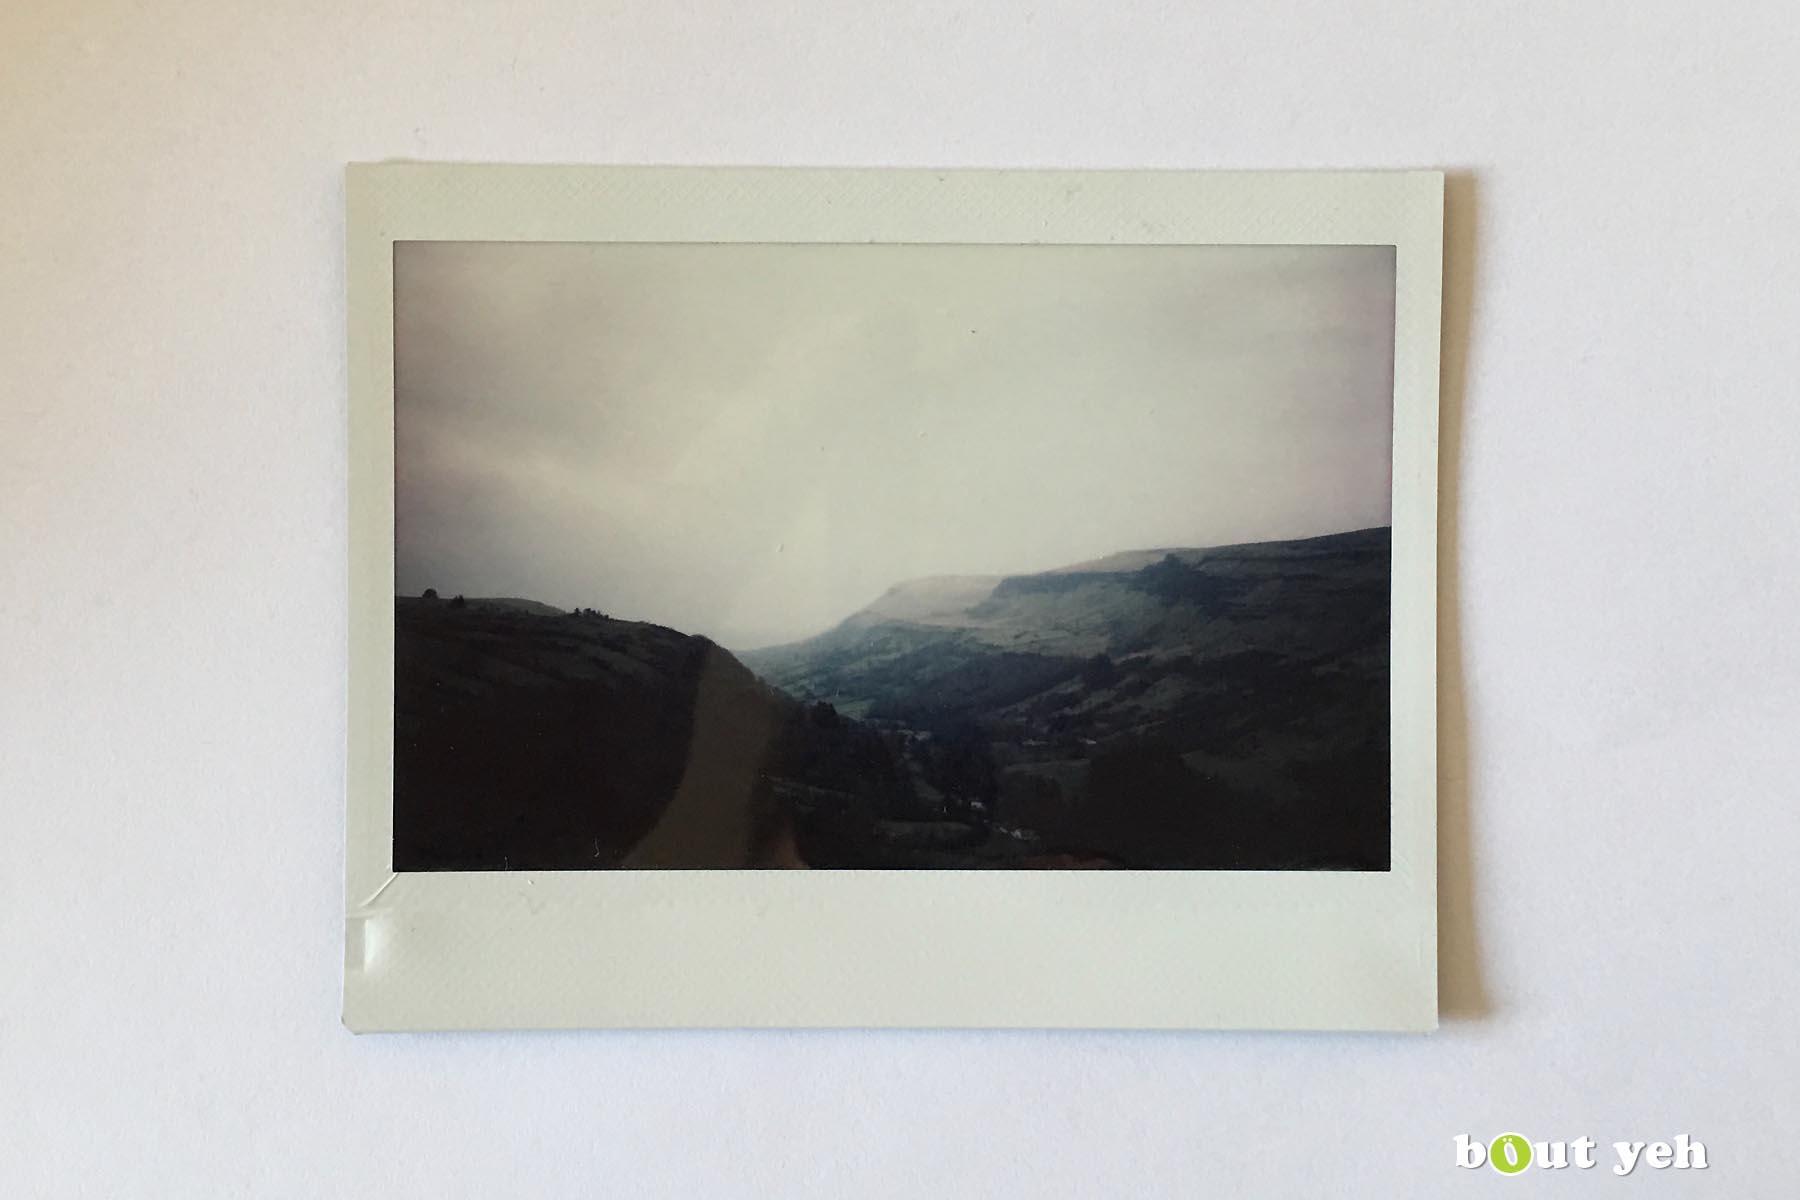 Polaroid photograph of Glenariff, Northern Ireland, by Maikel. Photo 1242.